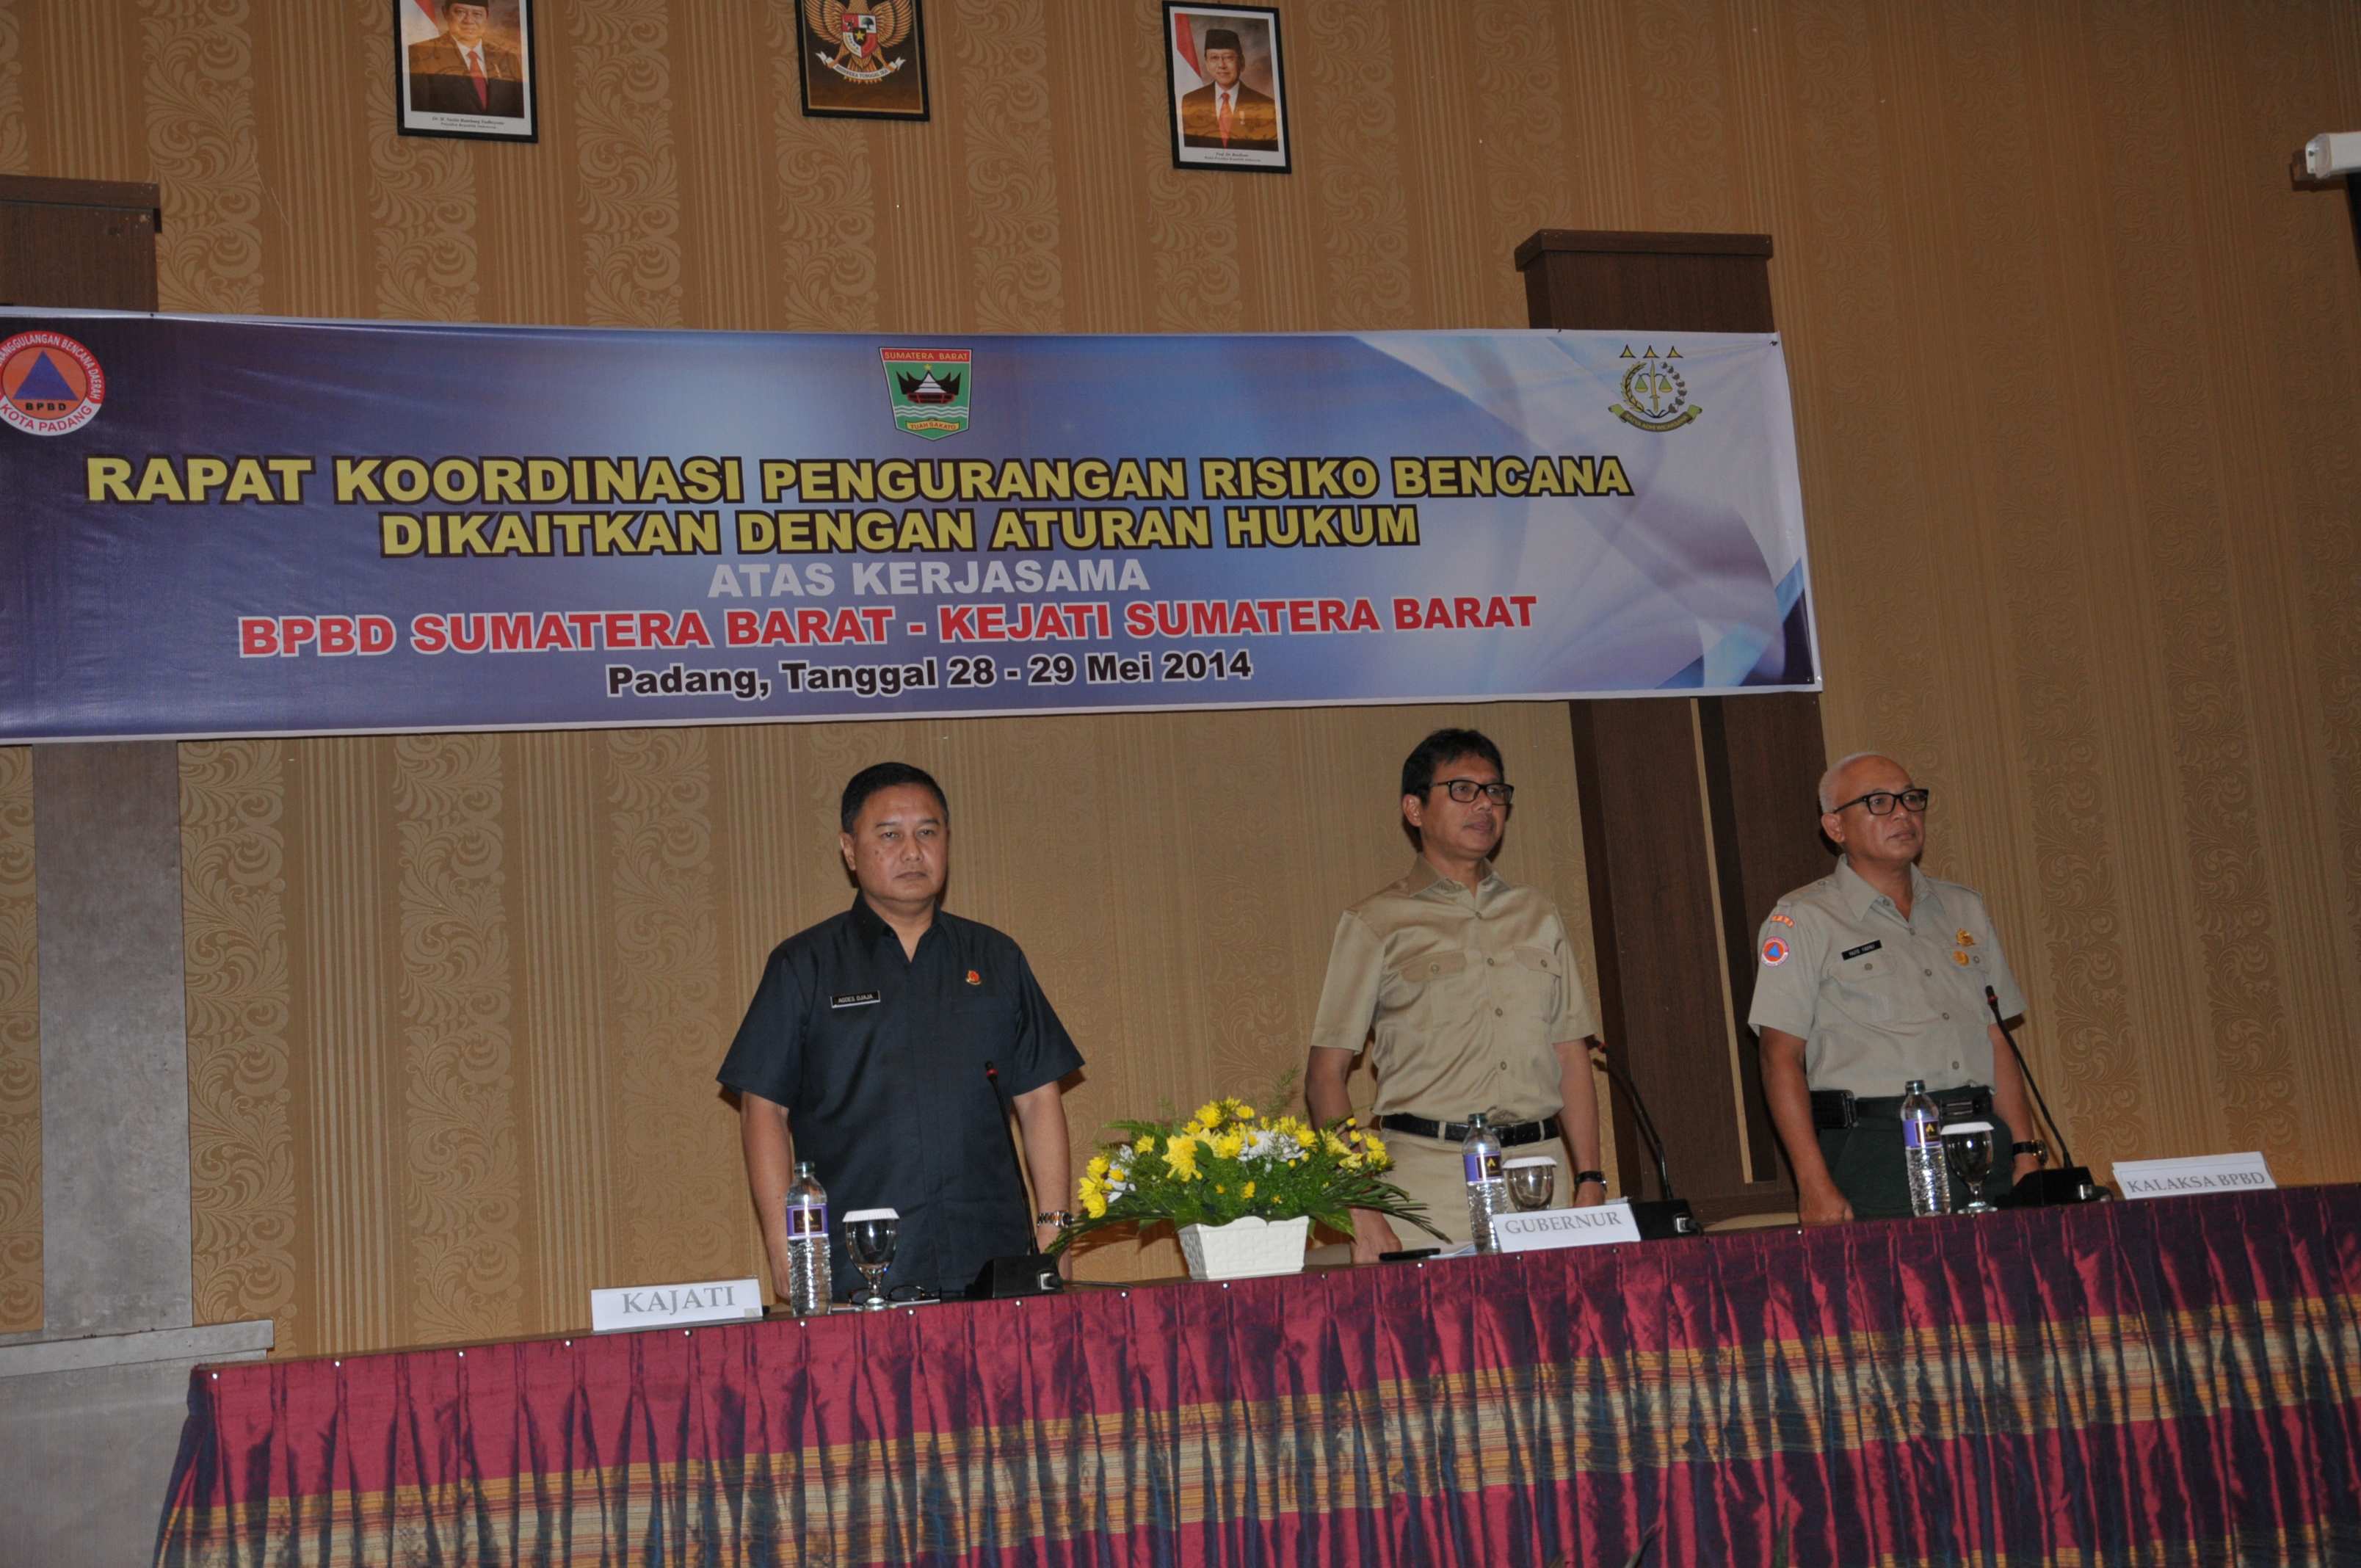 Rapat koordinasi Badan Penanggulangan Bencana Daerah dan Kejaksaan Tinggi Sumatera Barat. FOTO/IST